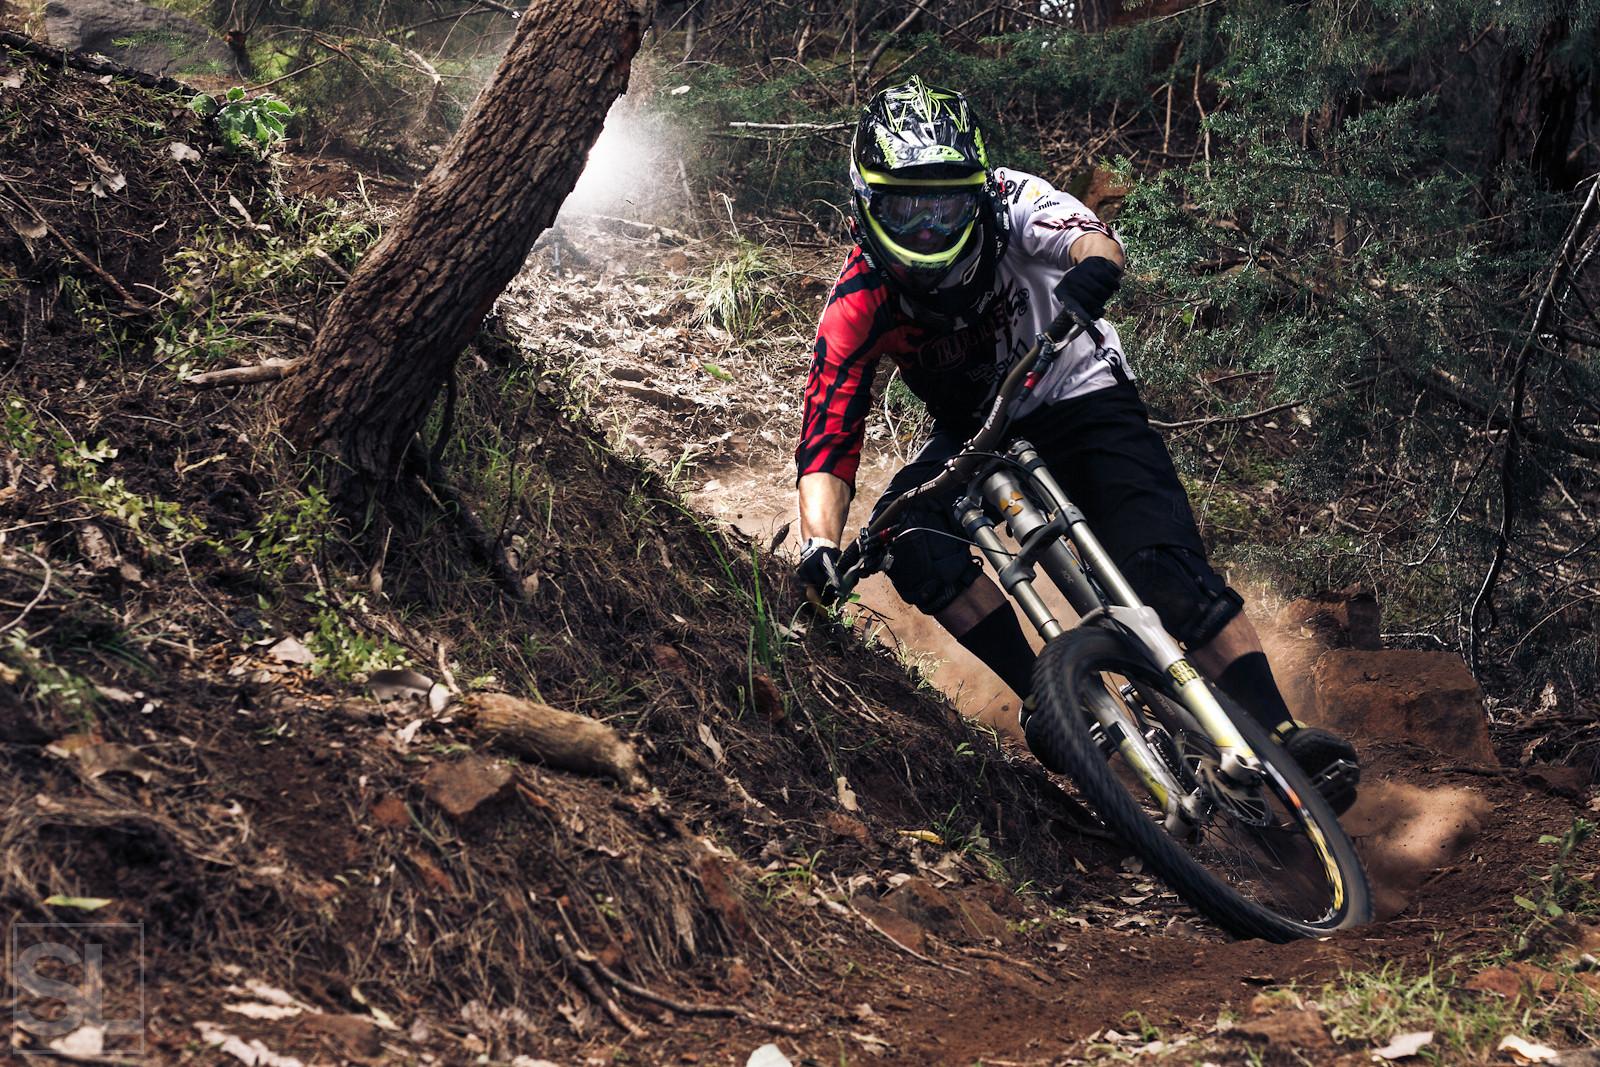 bar dragging - Chamakazi - Mountain Biking Pictures - Vital MTB